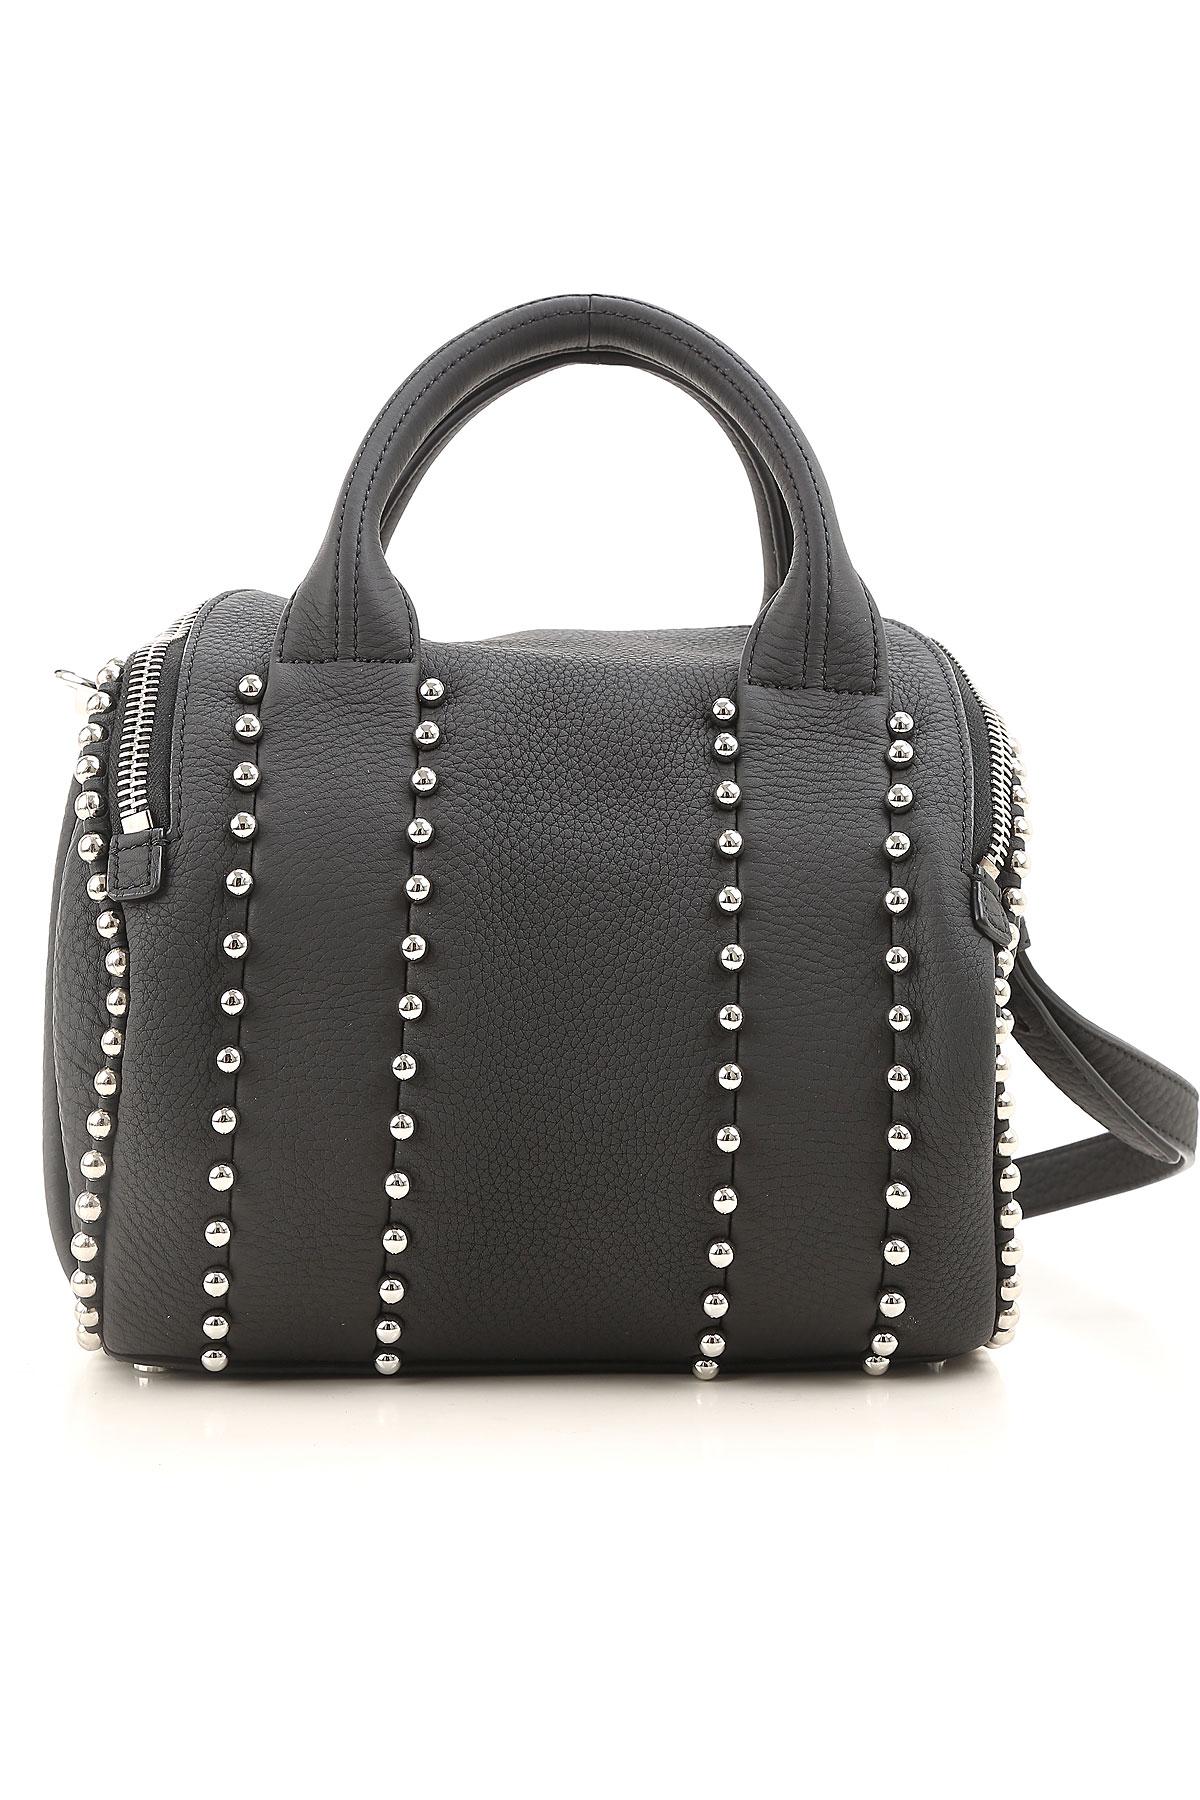 Image of Alexander Wang Top Handle Handbag, Black, Leather, 2017